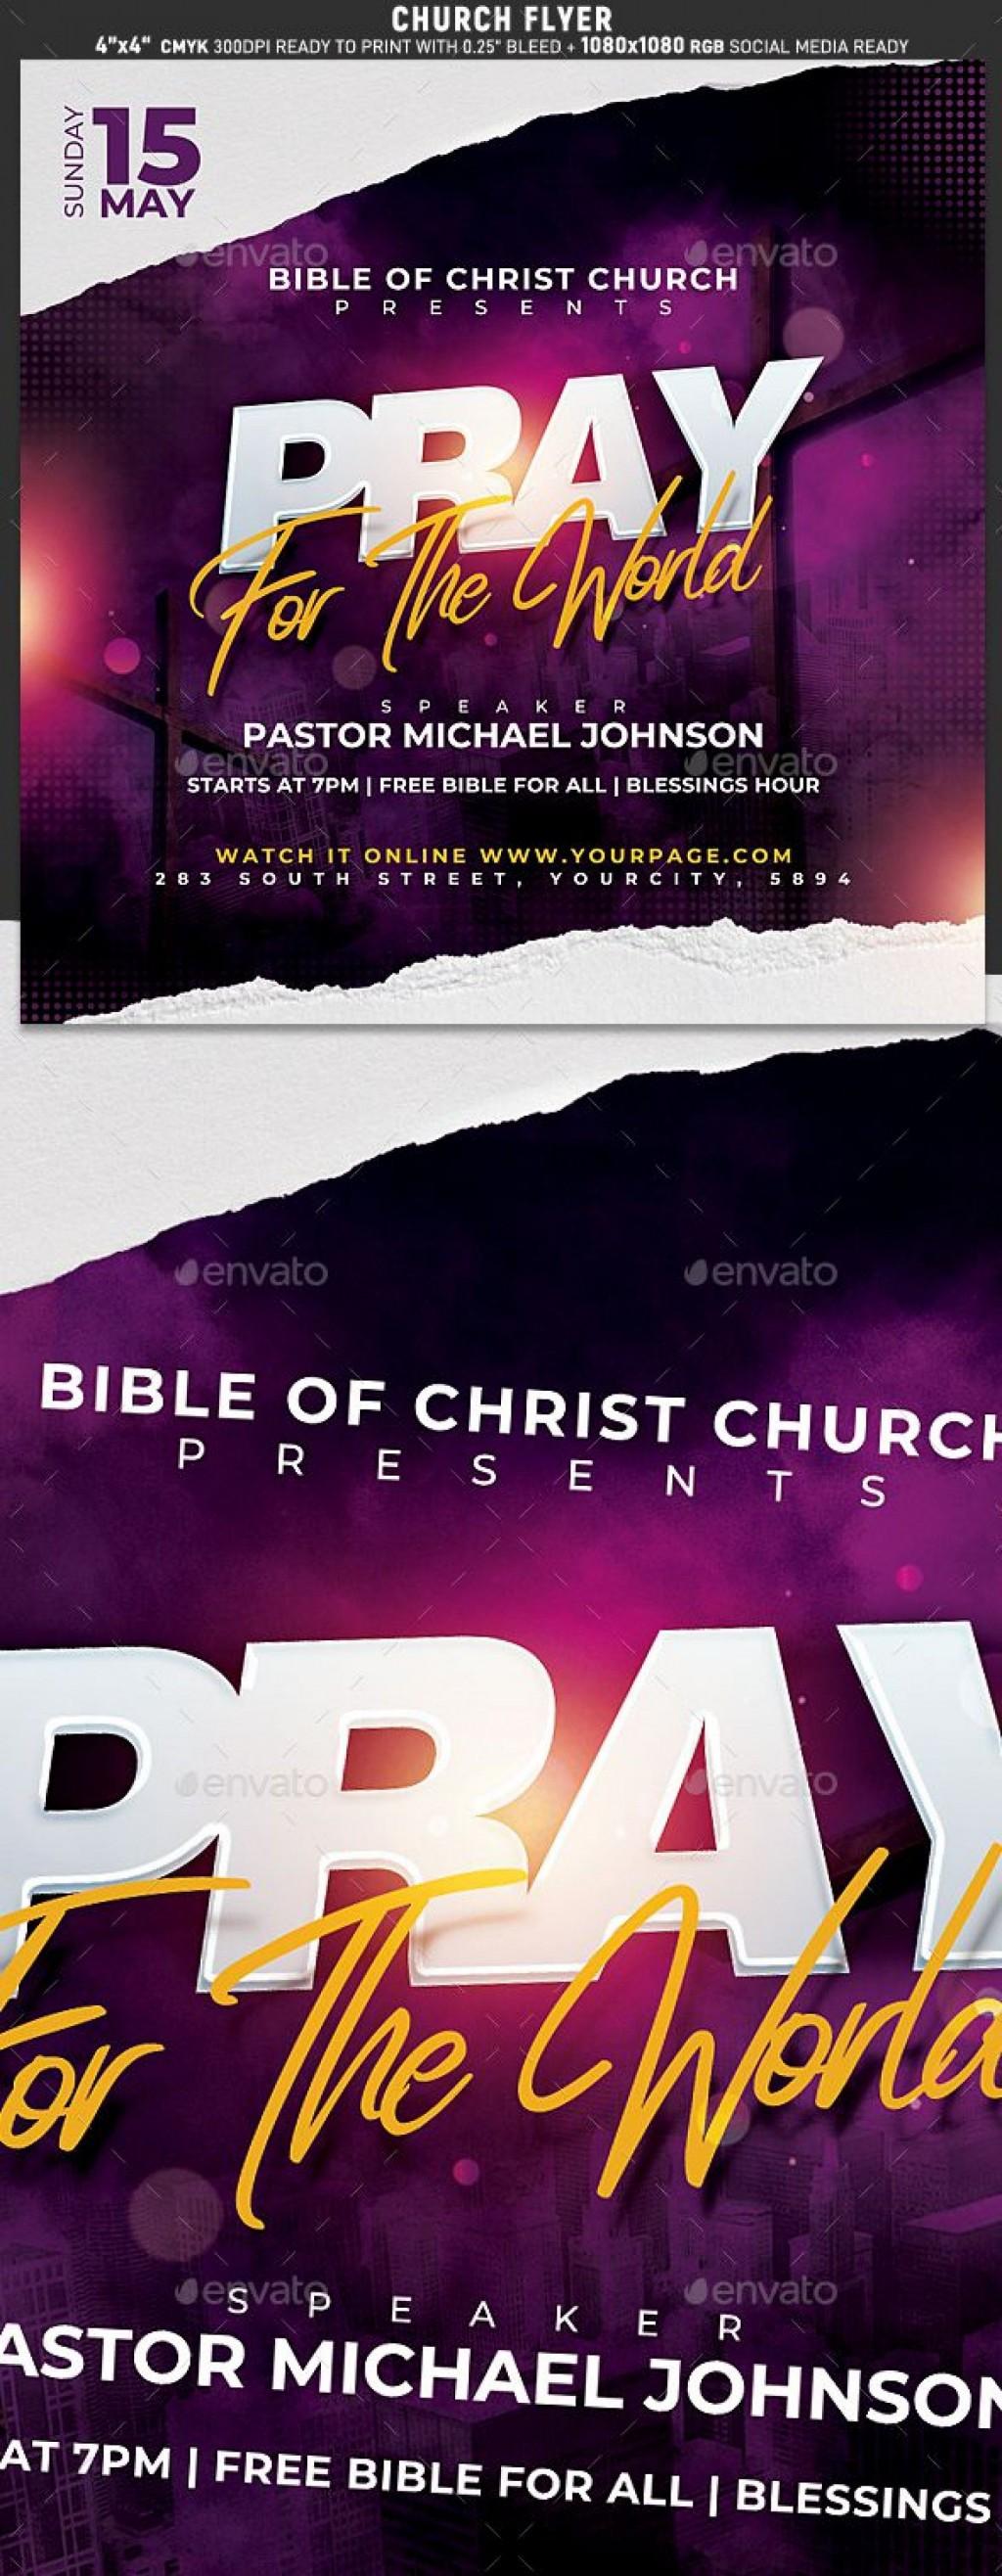 009 Marvelou Church Flyer Template Free Printable High Def  EventLarge